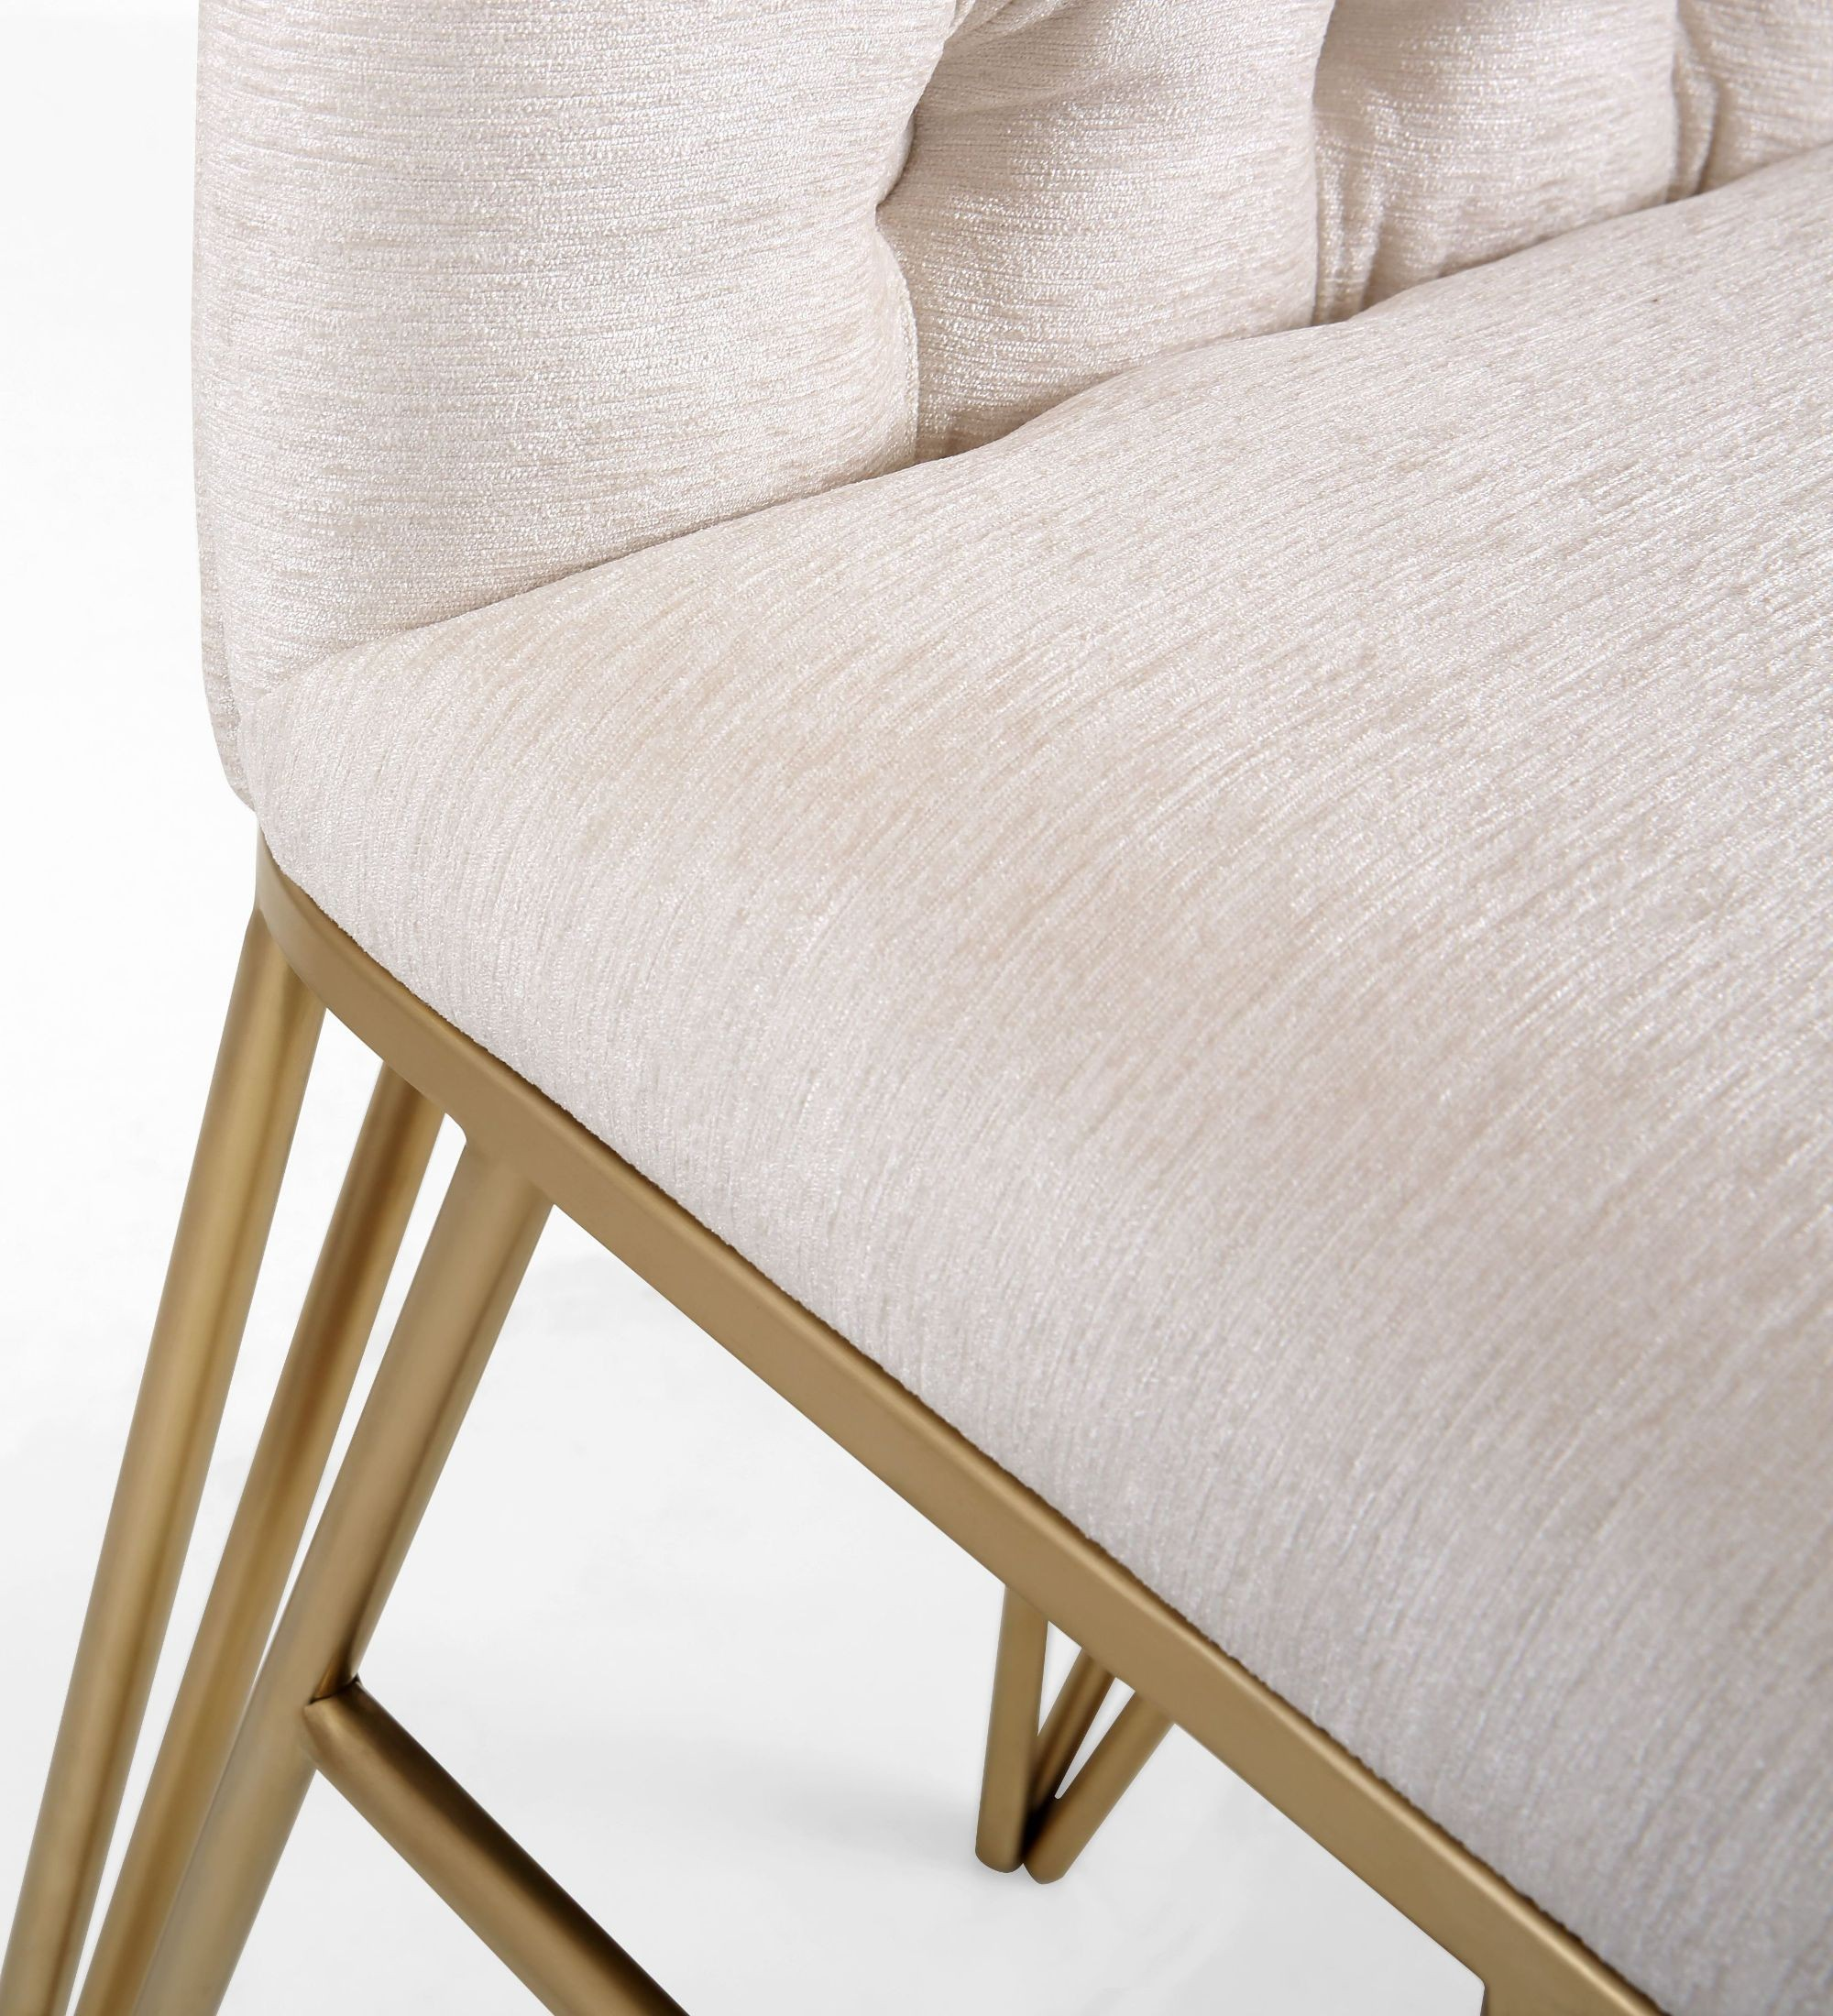 Lexi Cream Textured Velvet Bar Stool D3730 TOV Furniture : tov d37306tov from colemanfurniture.com size 2000 x 2200 jpeg 760kB